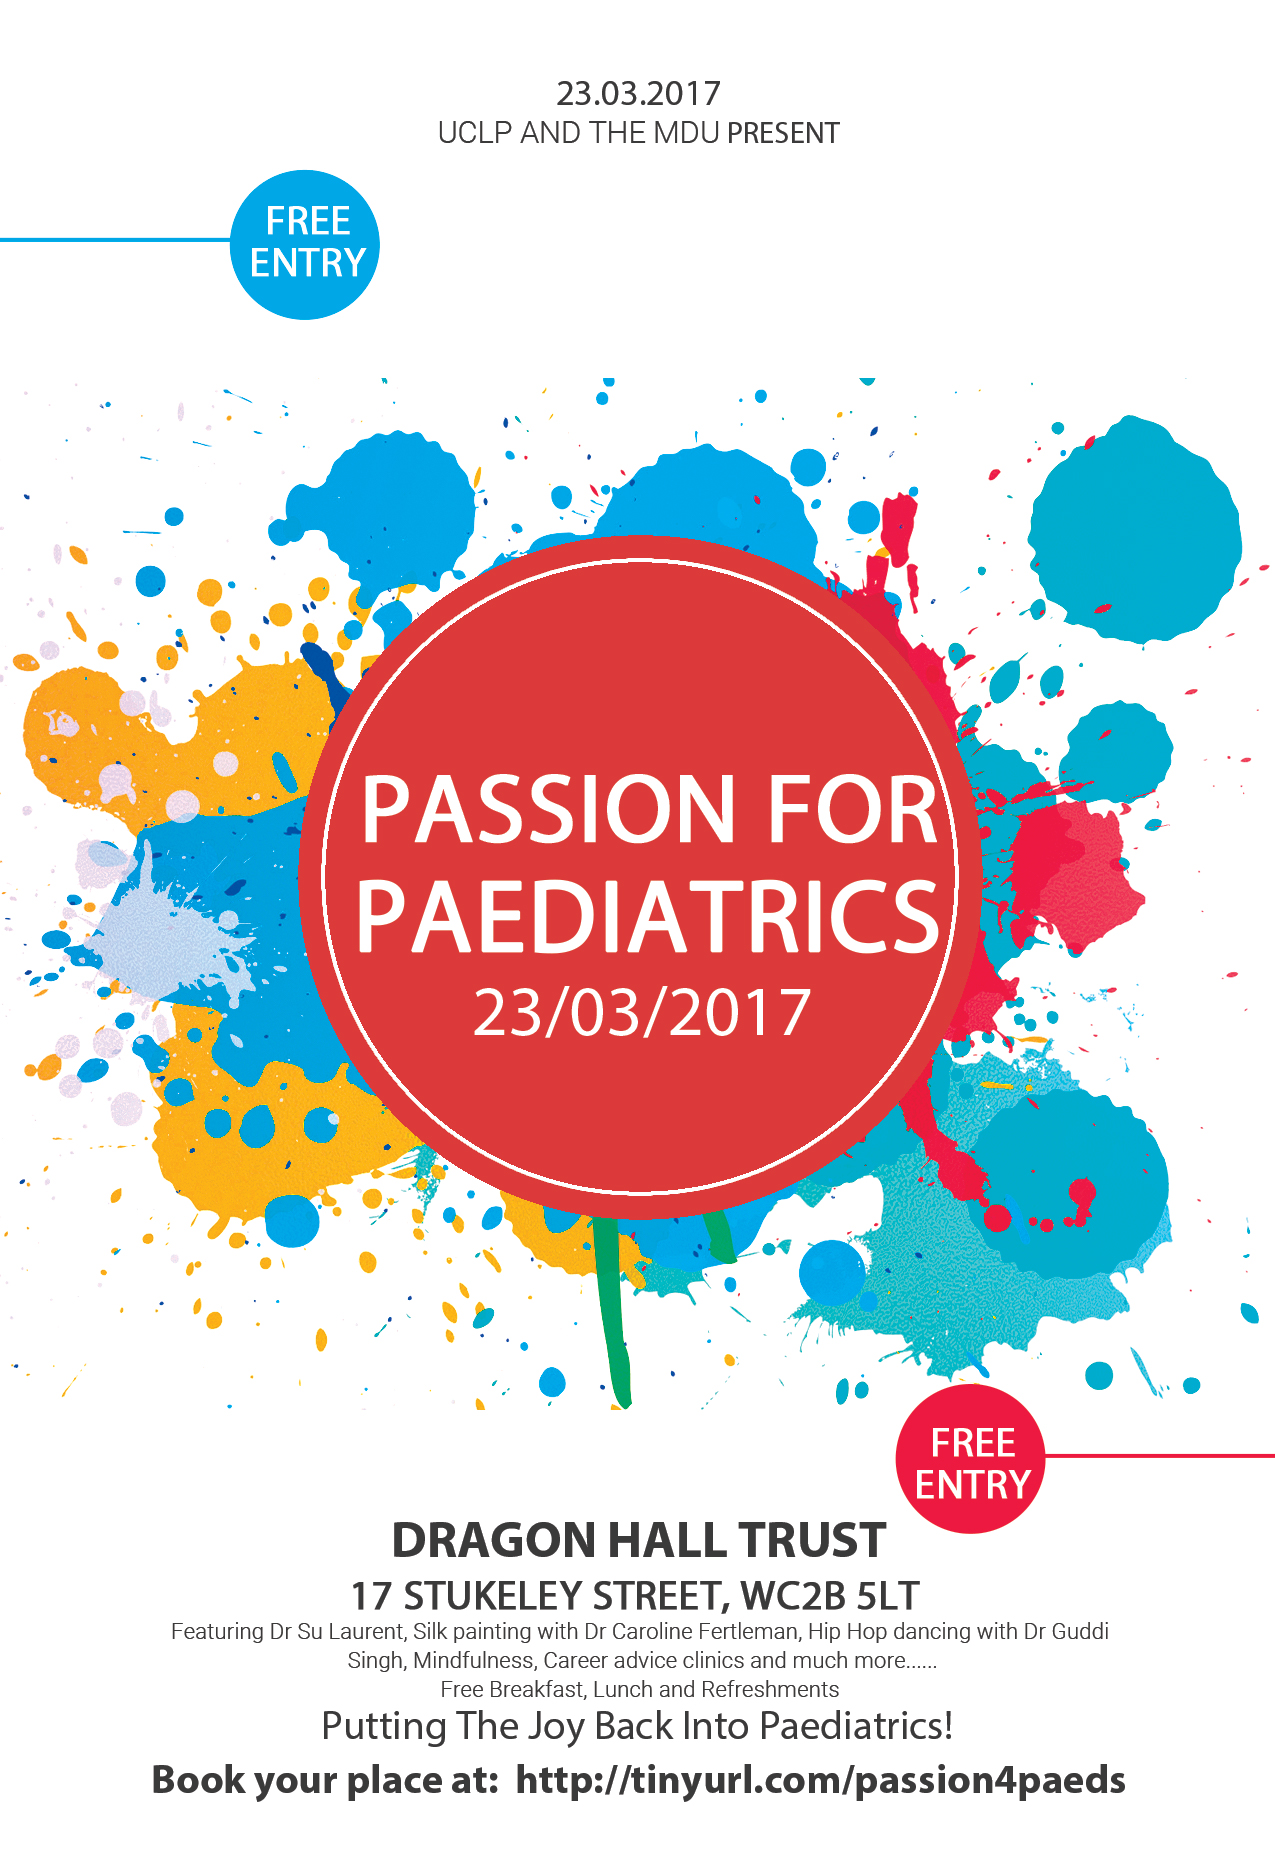 Passion For Paediatrics